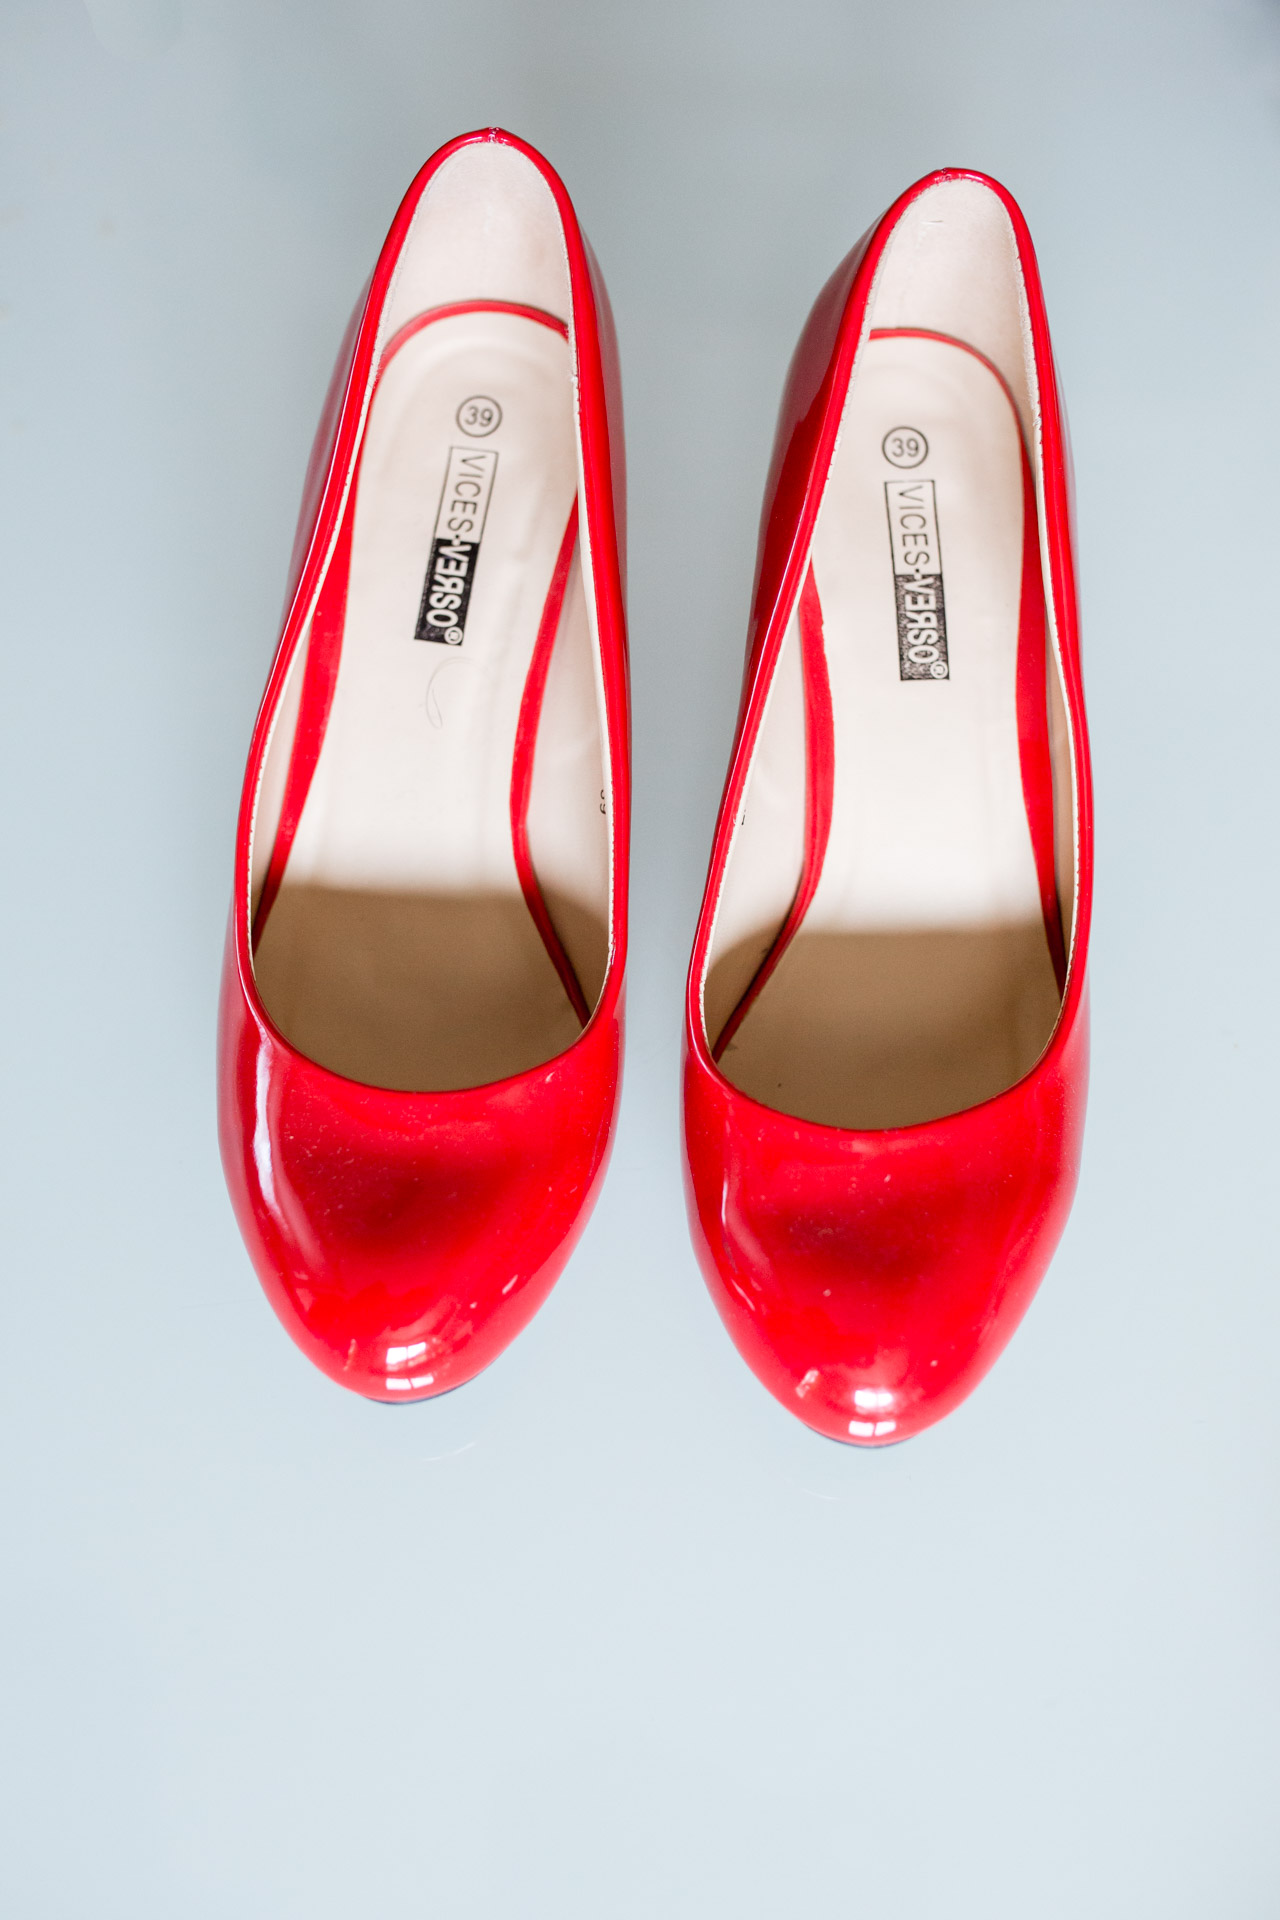 gros plan chaussure temoins de la mariee